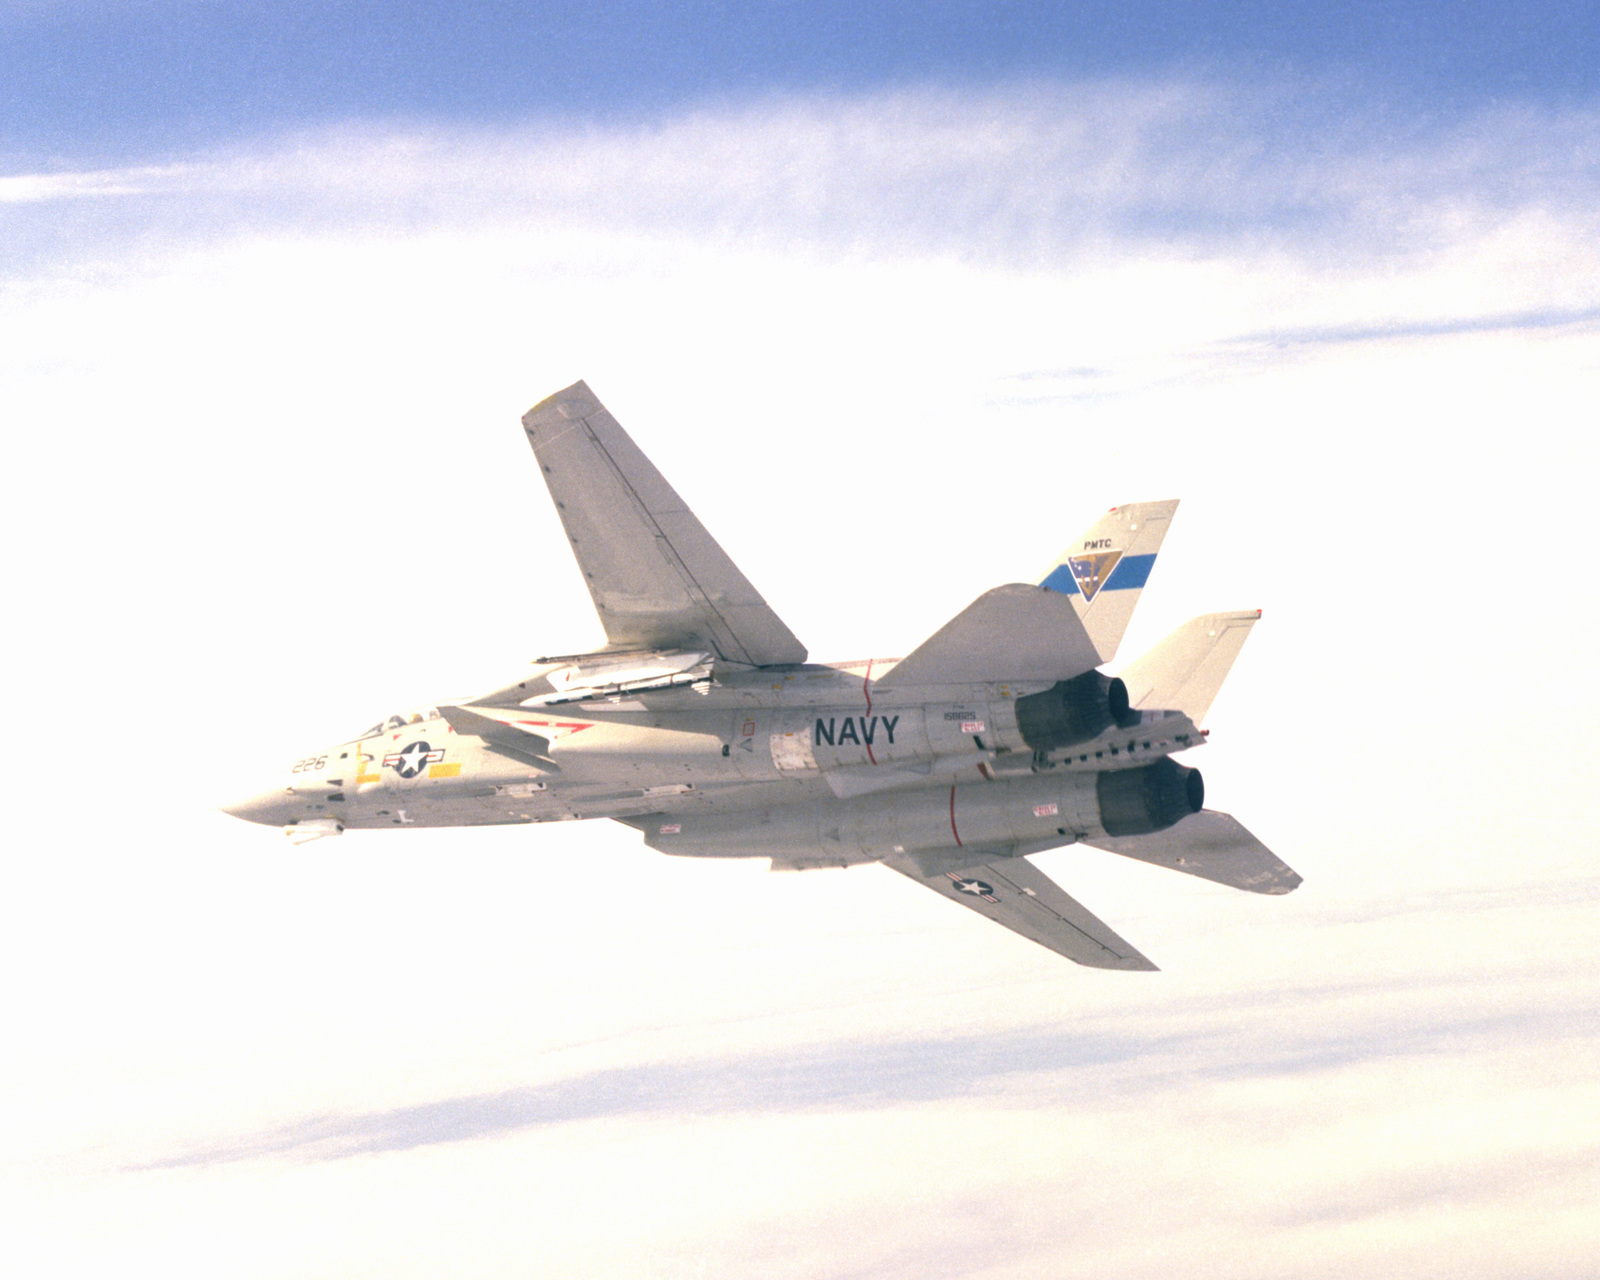 A view of an F-14A Tomcat aircraft with advanced medium